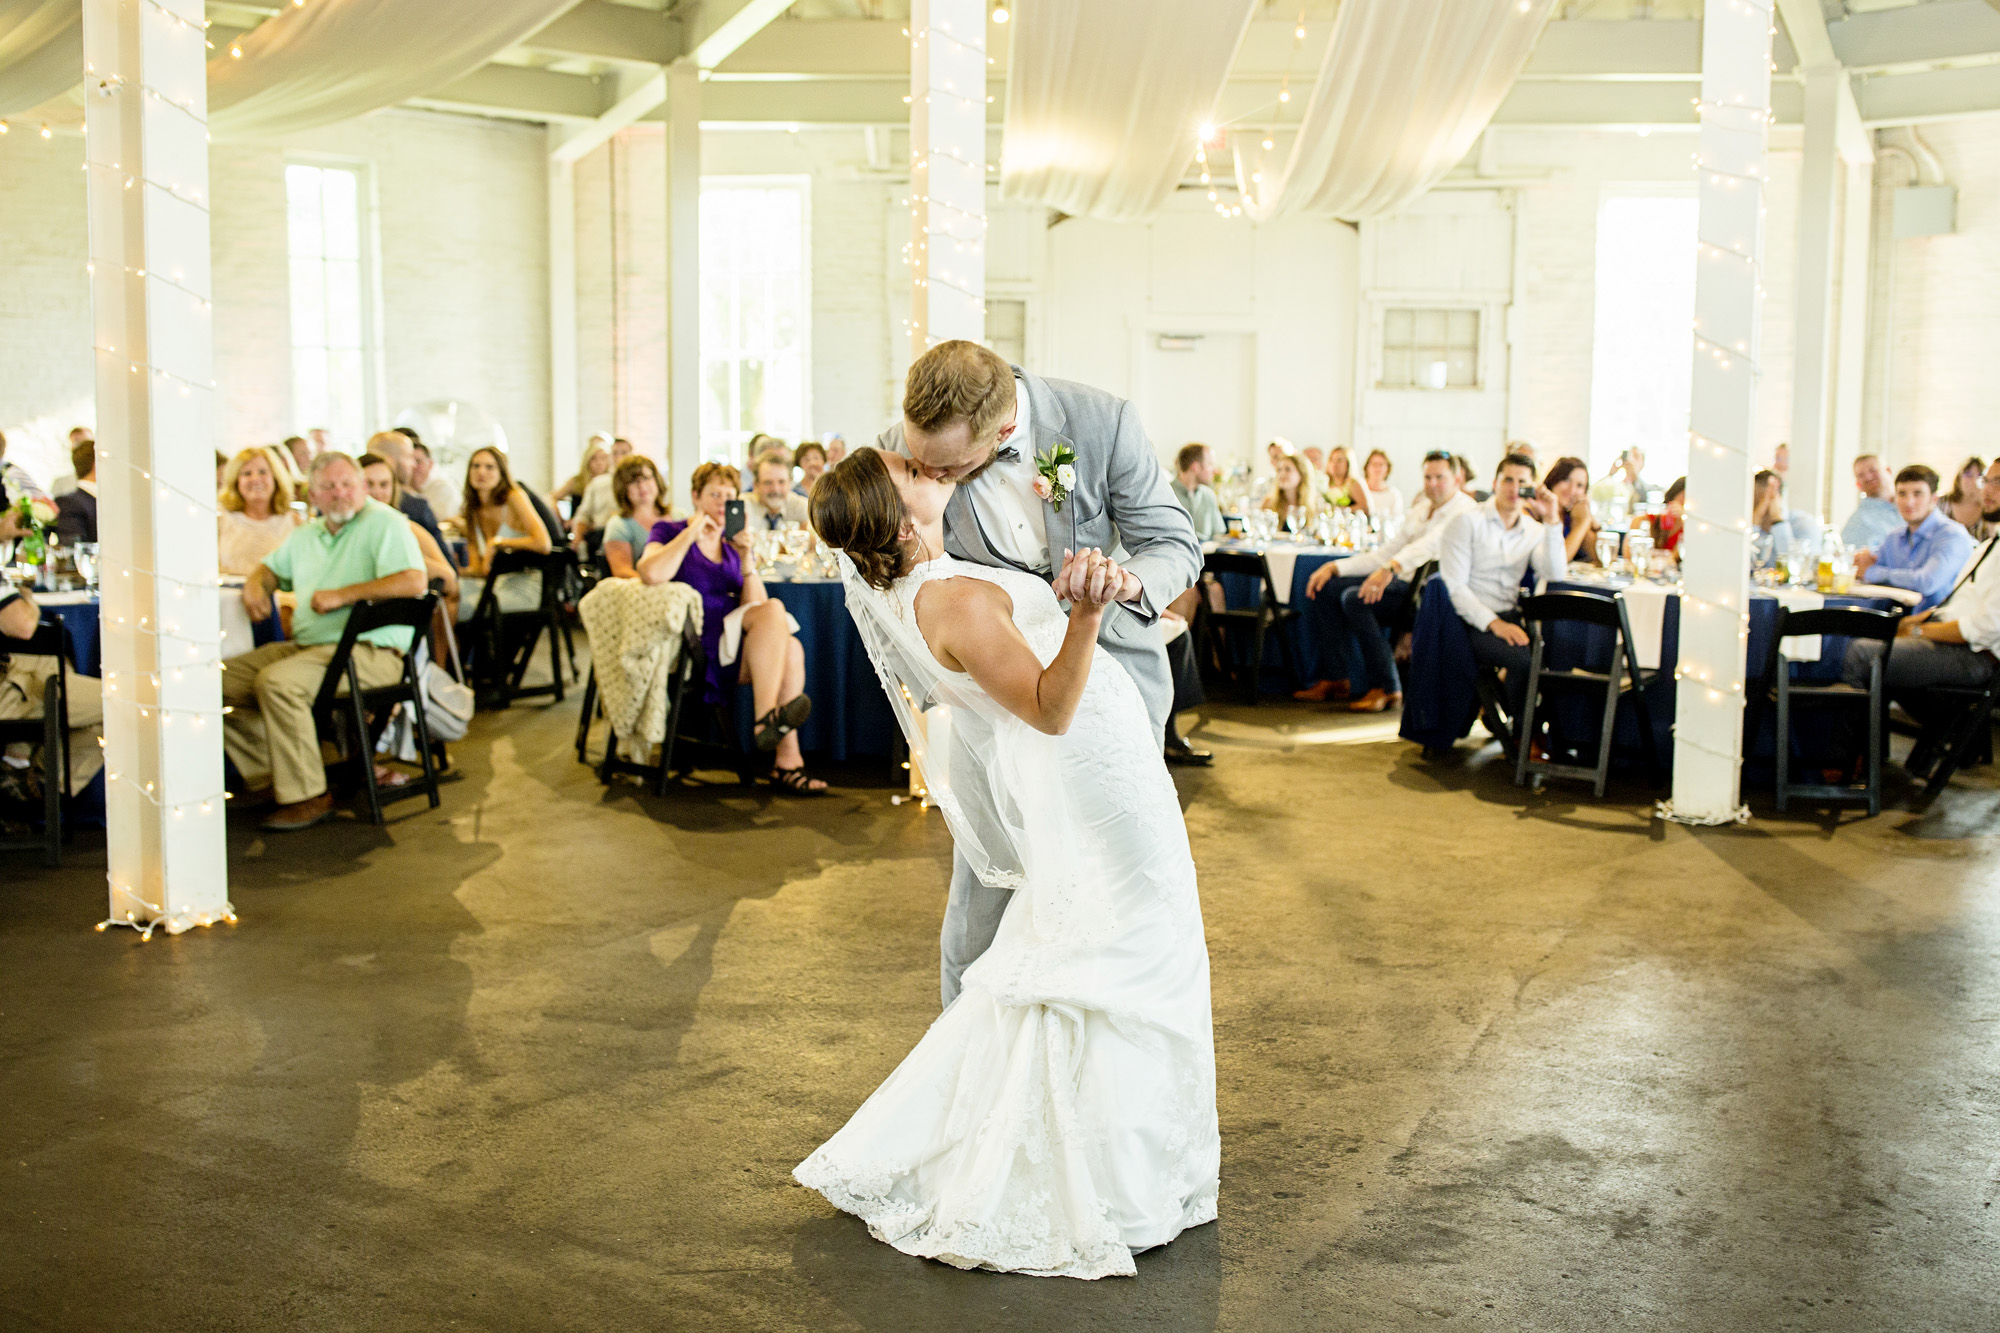 Seriously_Sabrina_Photography_Lexington_Kentucky_Round_Barn_Red_Mile_Stable_of_Memories_Wedding_Hart_99.jpg